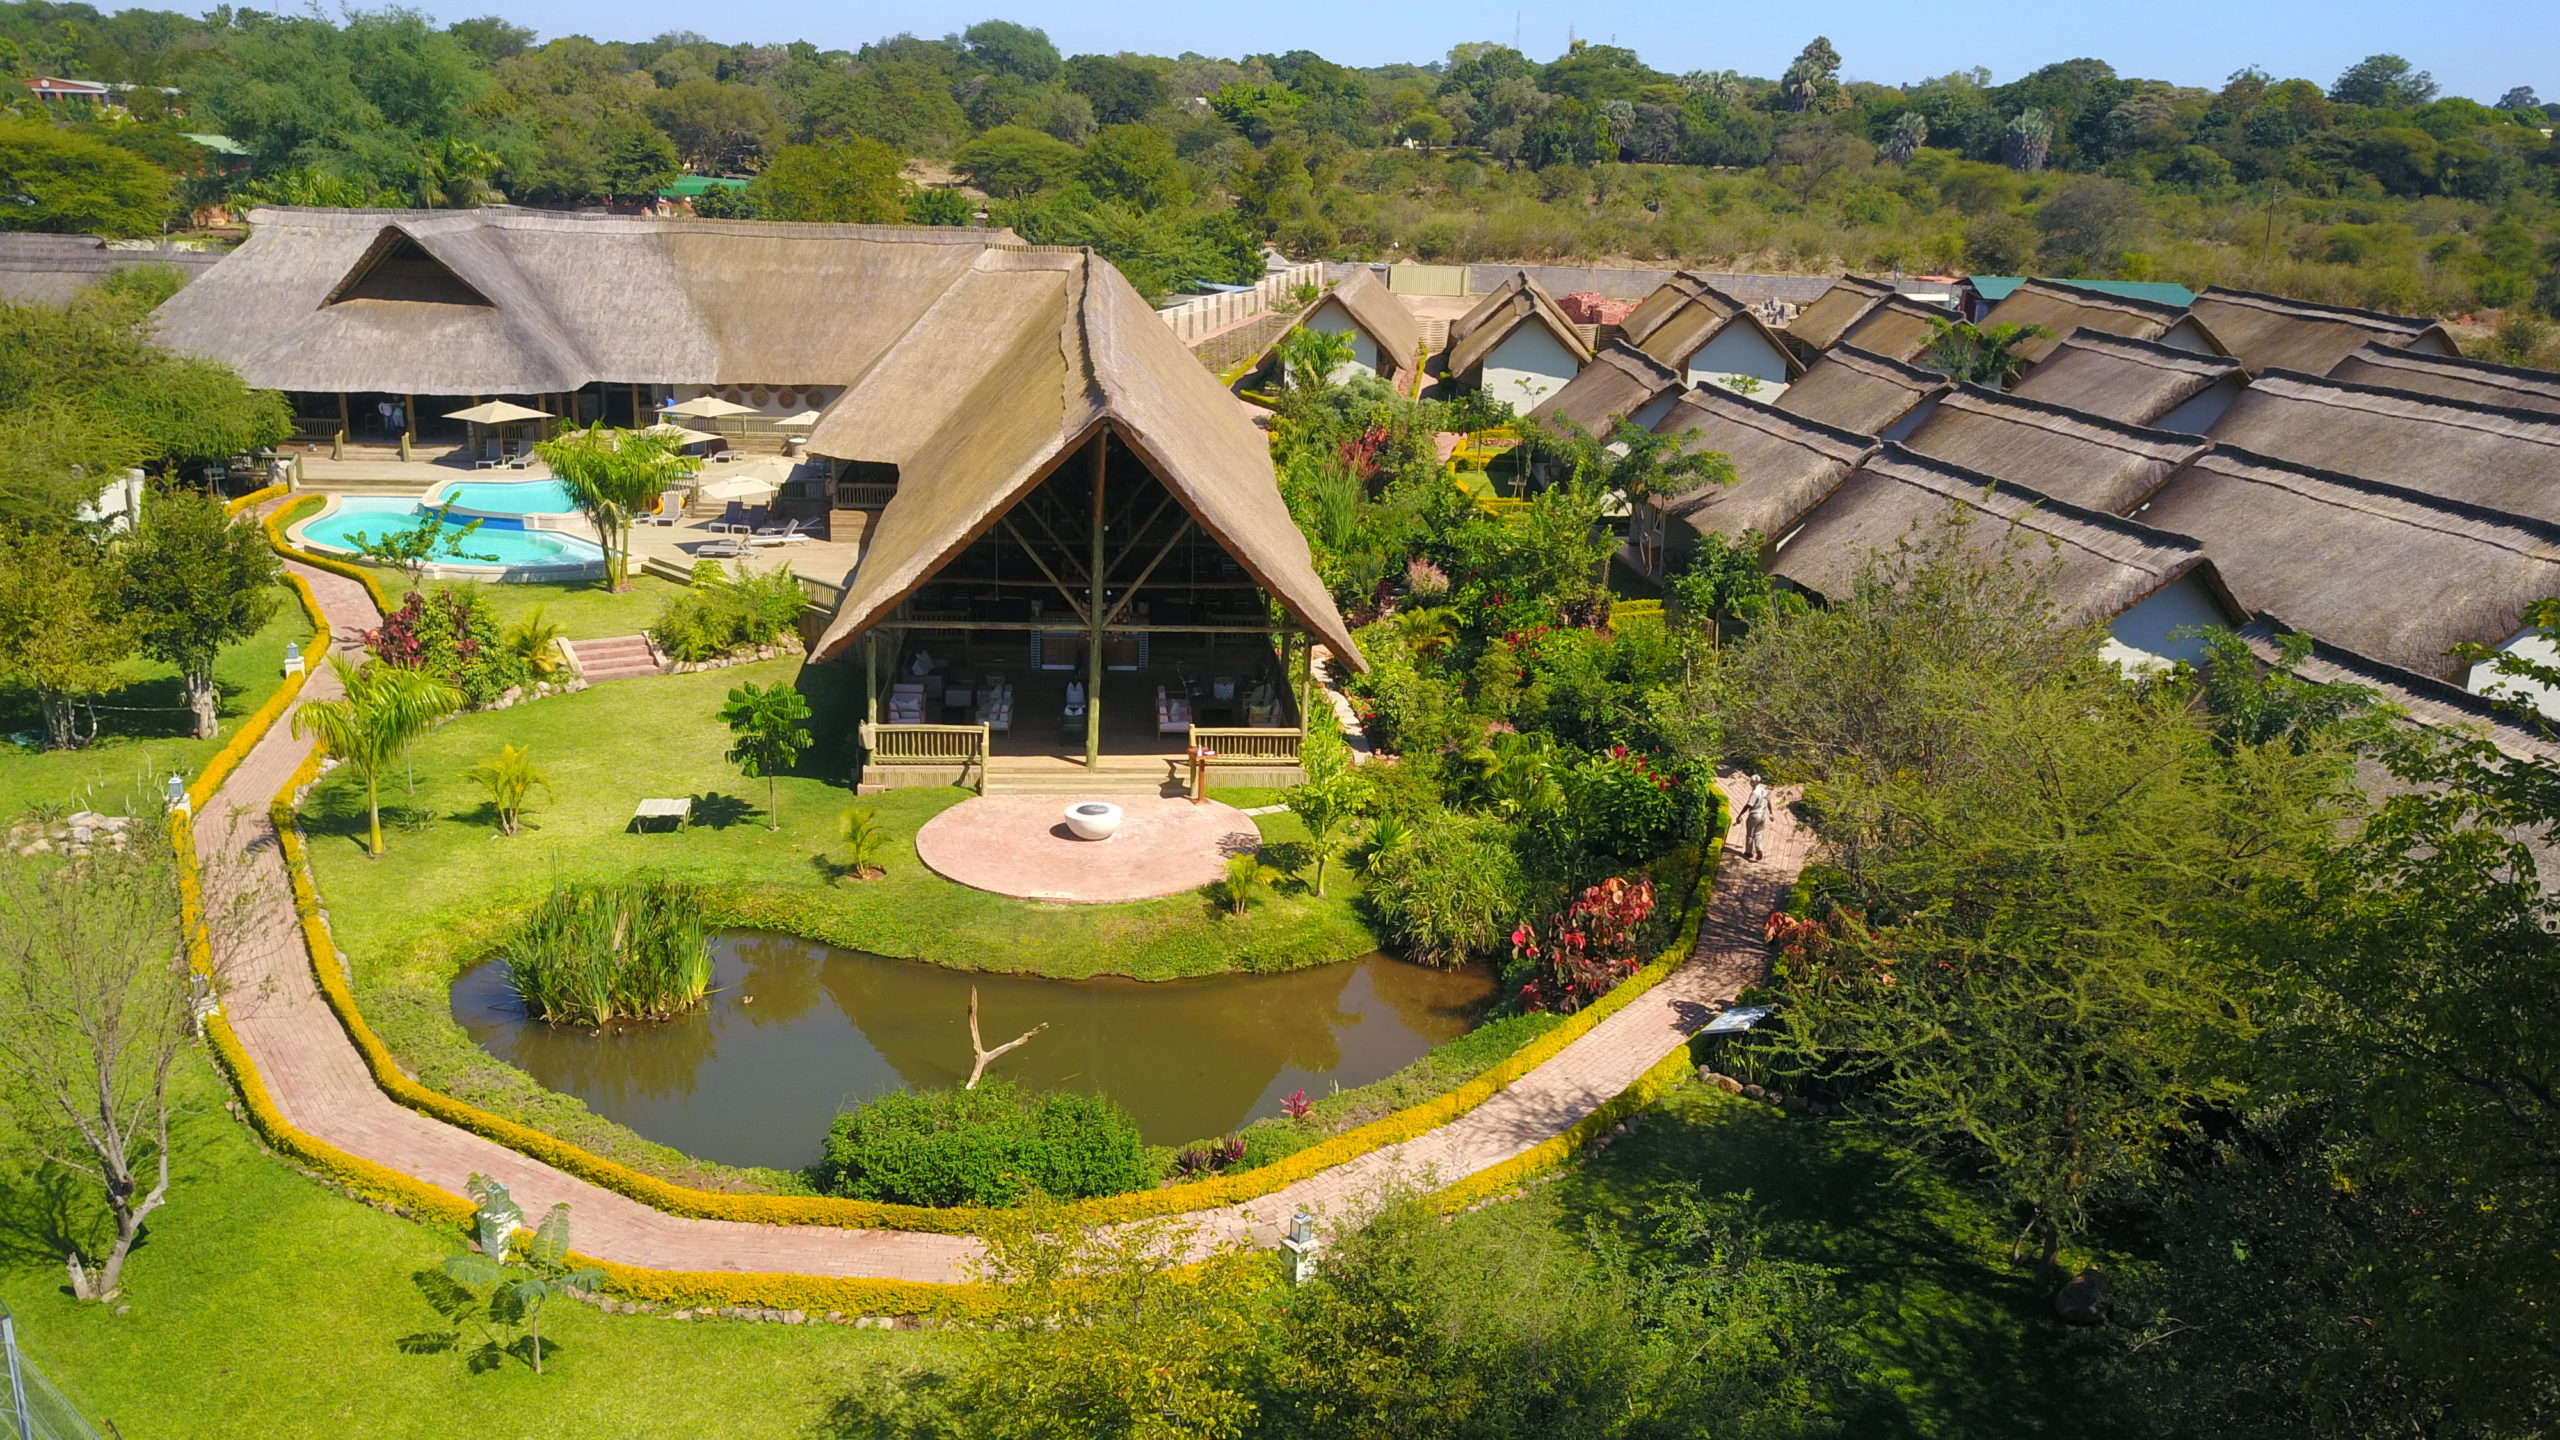 explorers-village-aerial-view